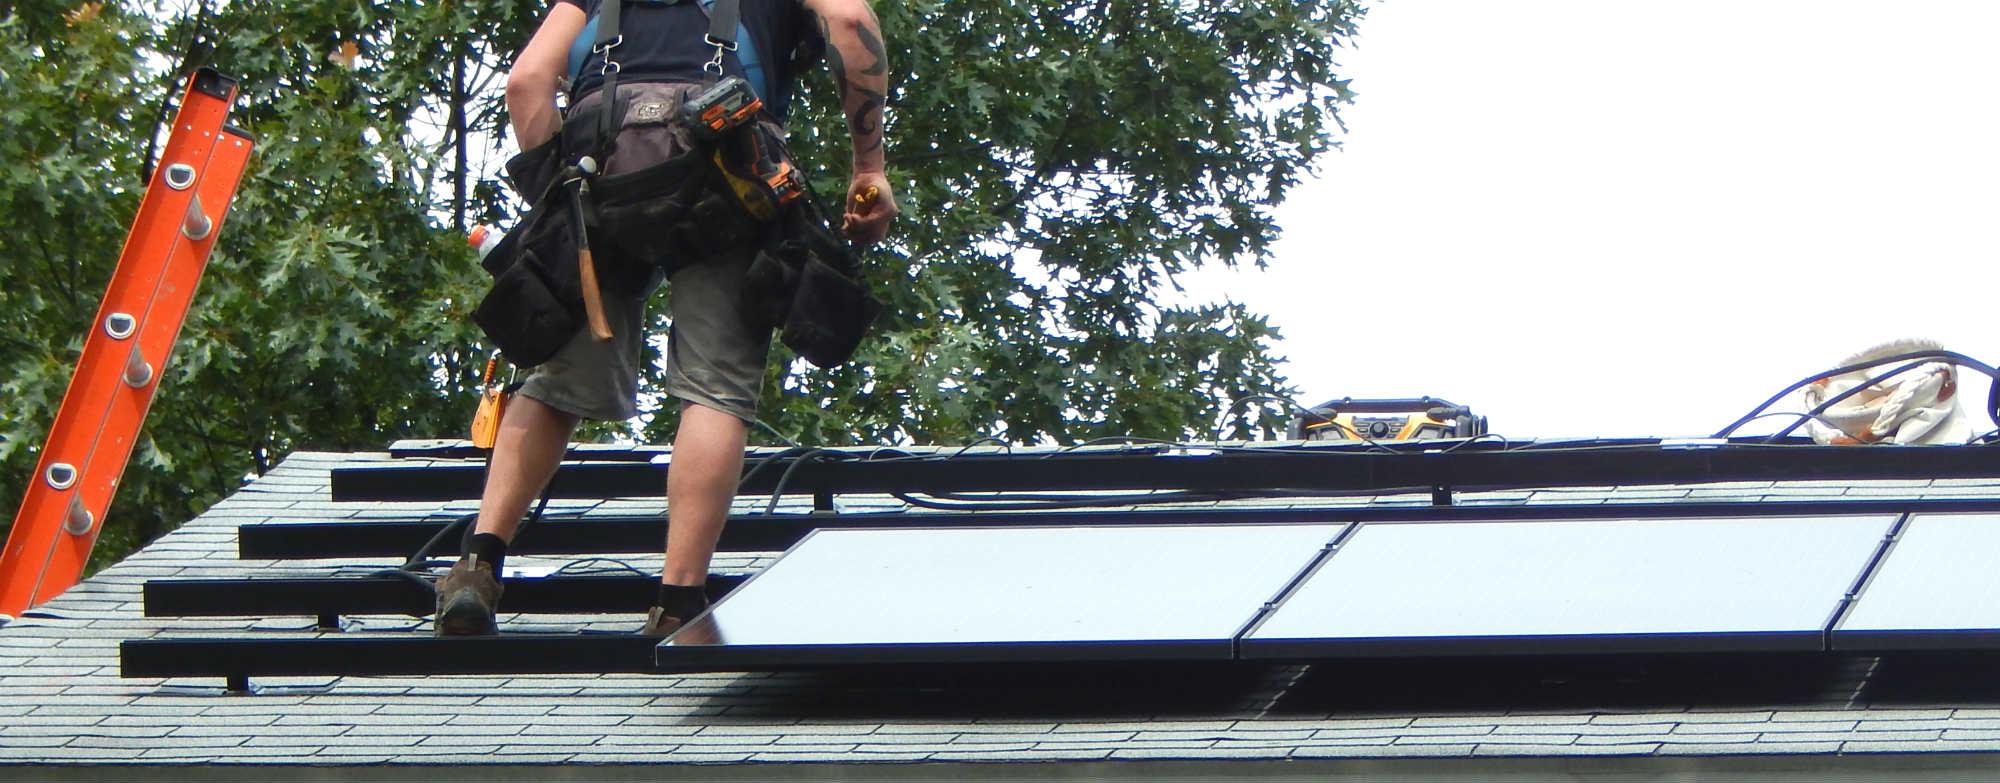 NYSERDA block grant rebates help make solar affordable for more New York residents